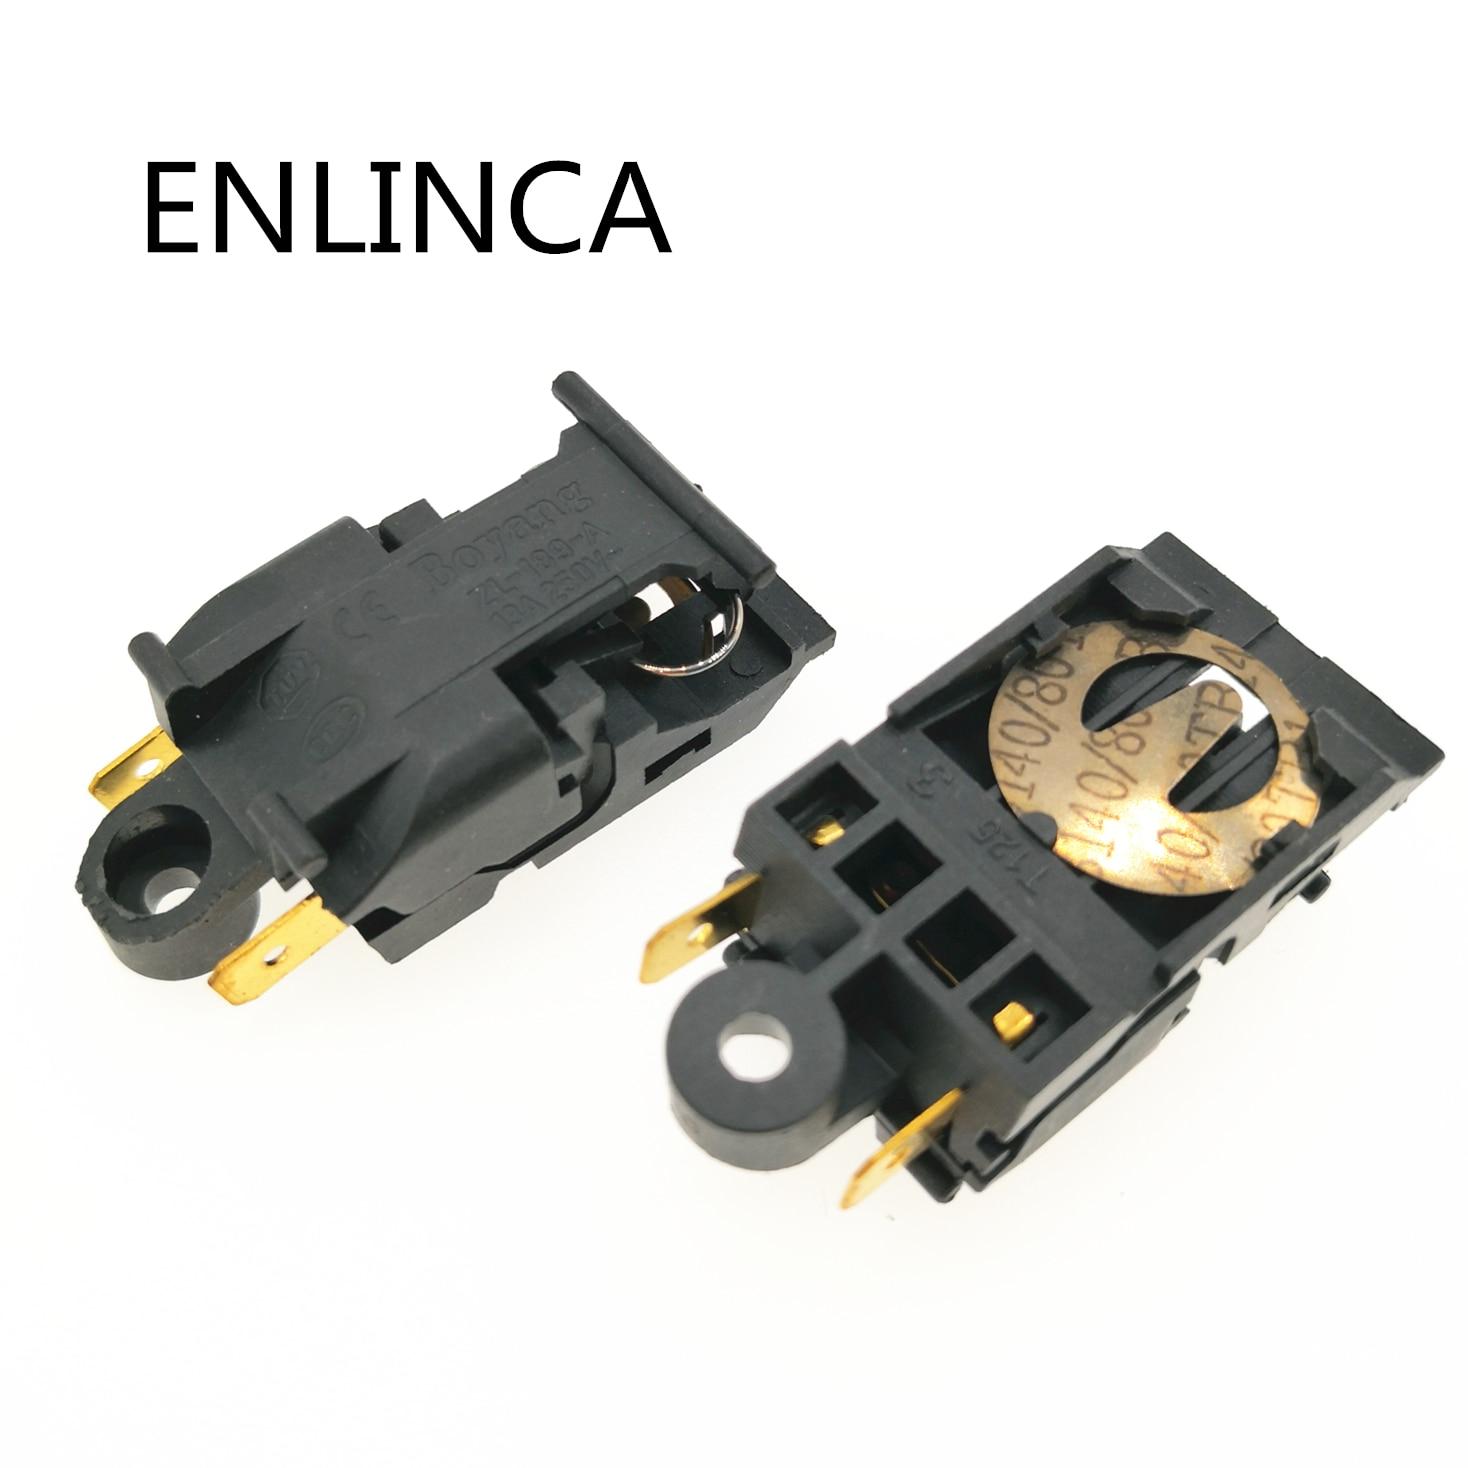 5 pçs/lote ZL-189-A T125 interruptor termostato chaleira 13A